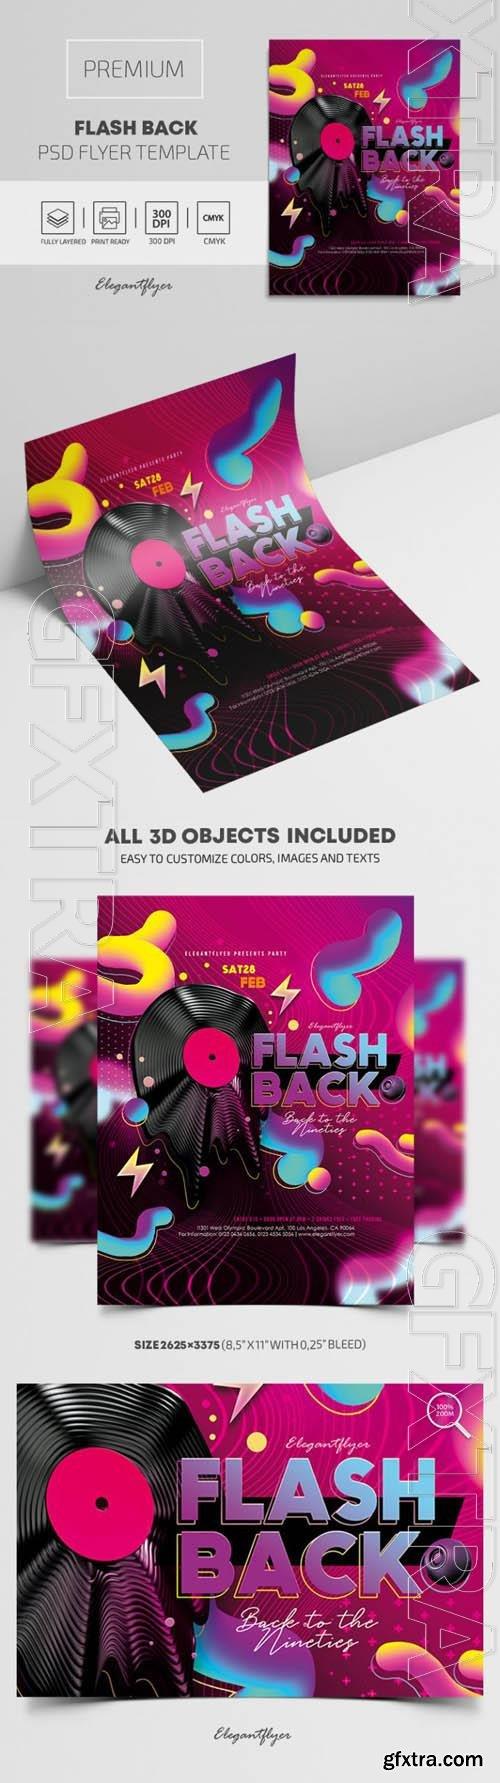 Flash Back Premium PSD Flyer Template